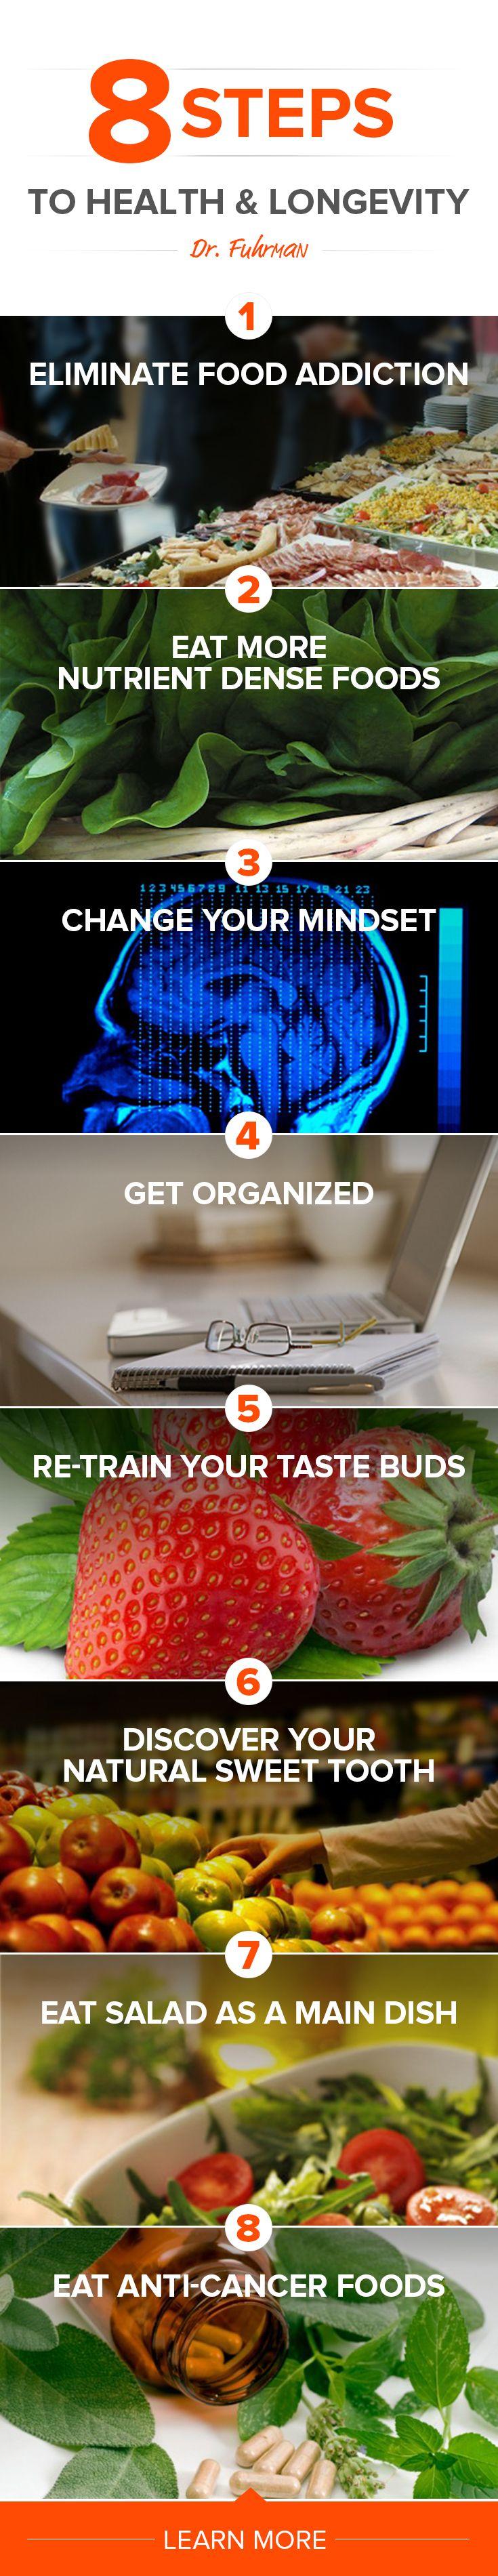 8 Steps to excellent health and longevity via Dr. Fuhrman